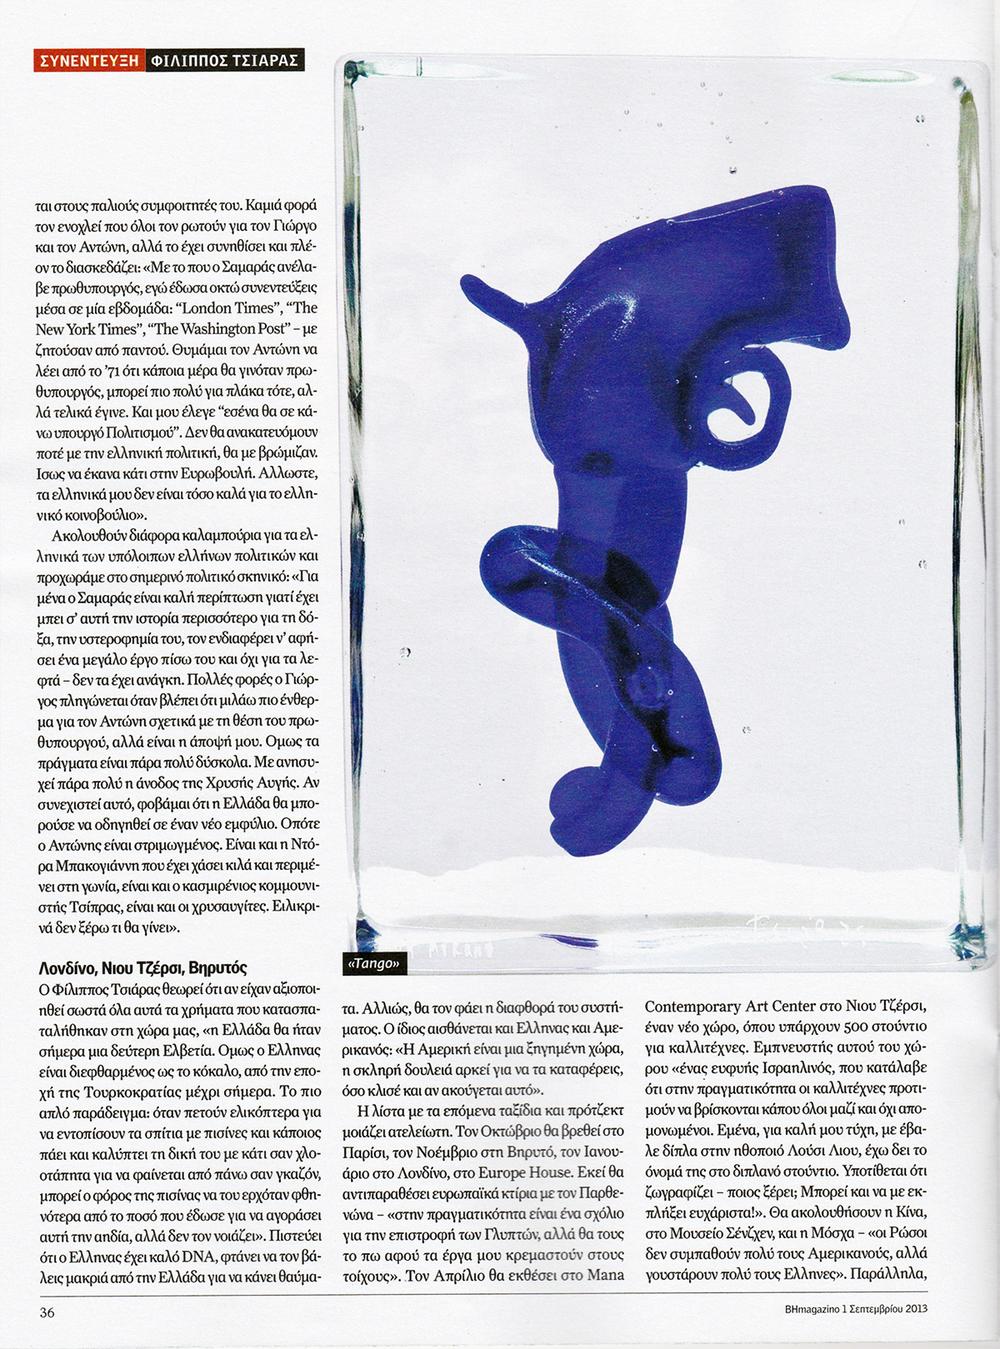 BH-Magazine-pg-03.jpg